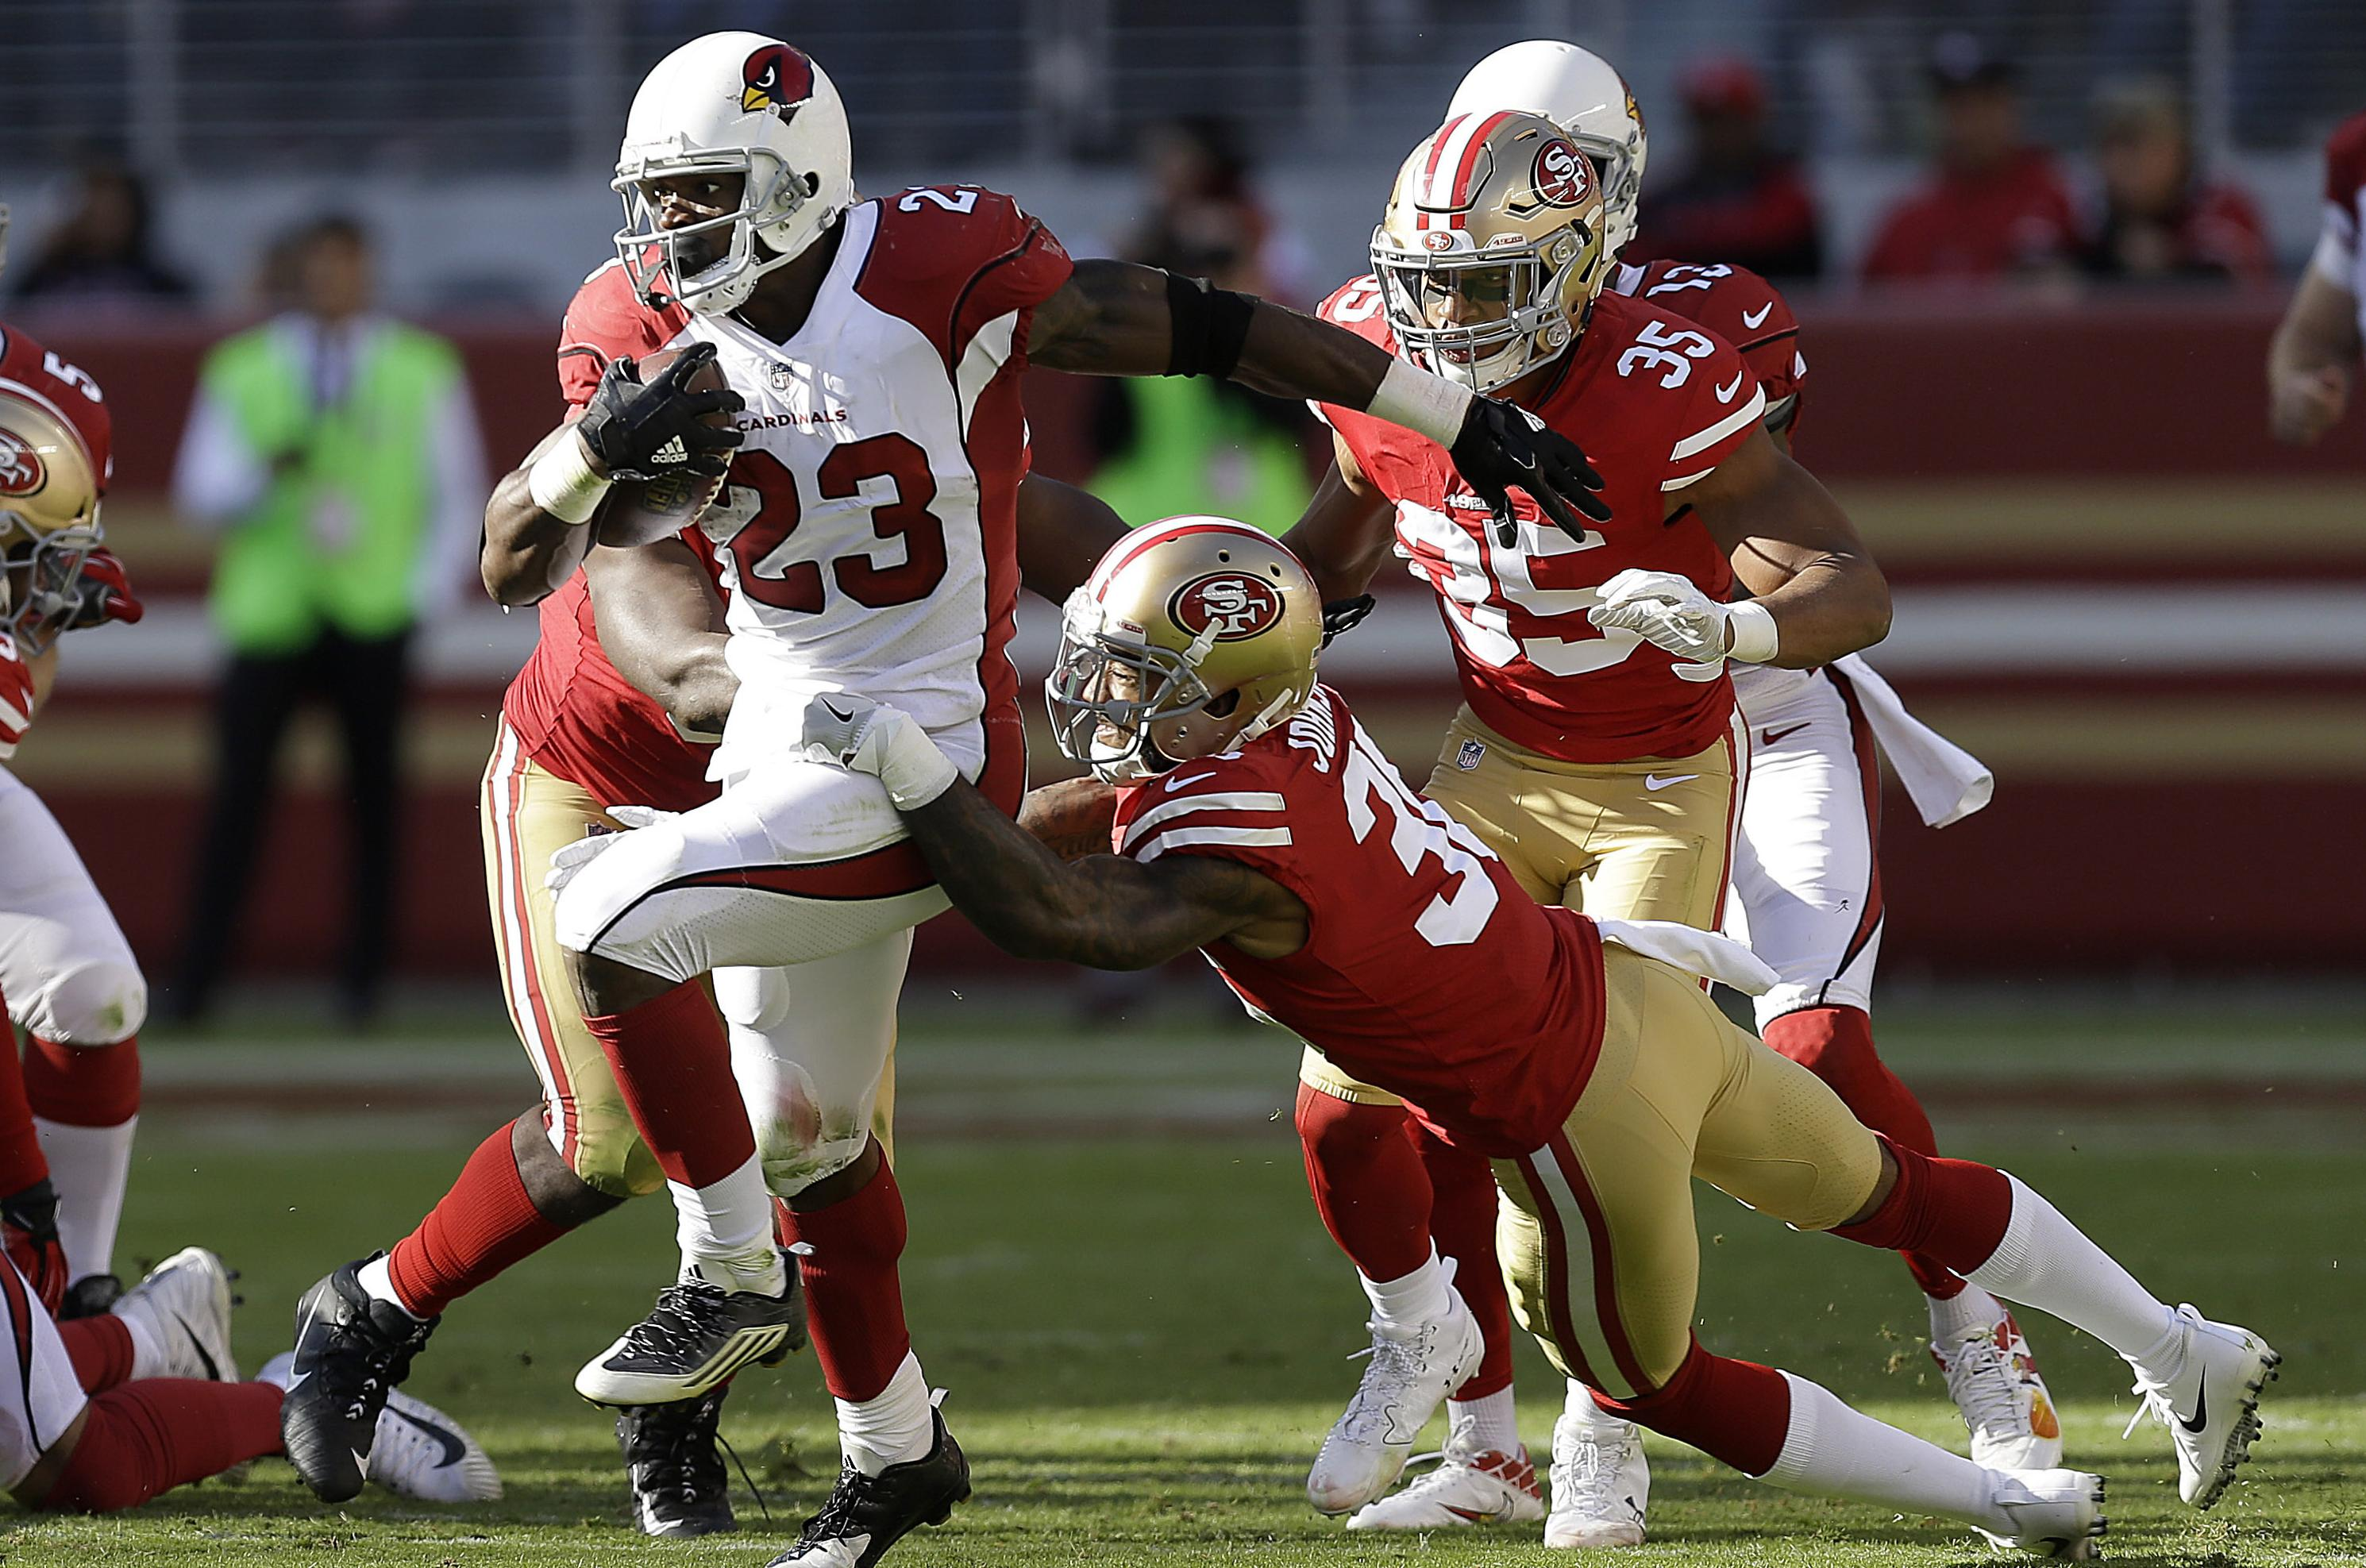 c1420ce5e Arizona Cardinals running back Adrian Peterson (23) runs against the San  Francisco 49ers during